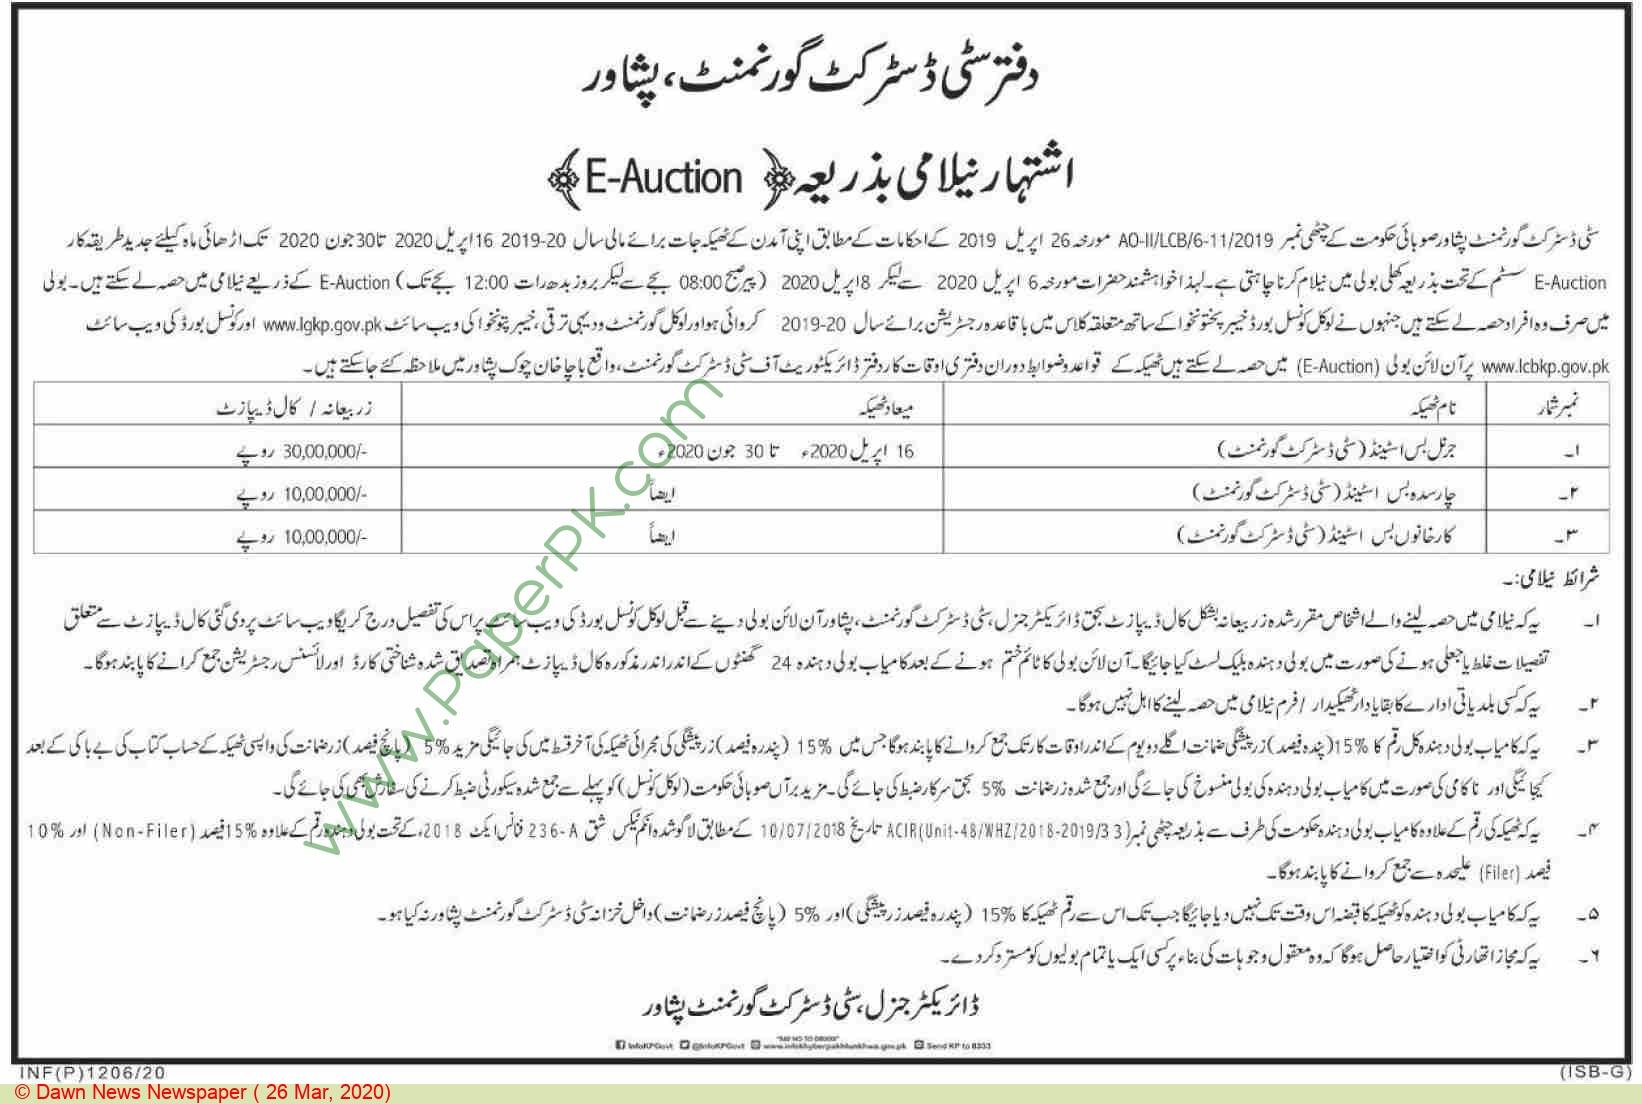 City Government Peshawar Auction Notice